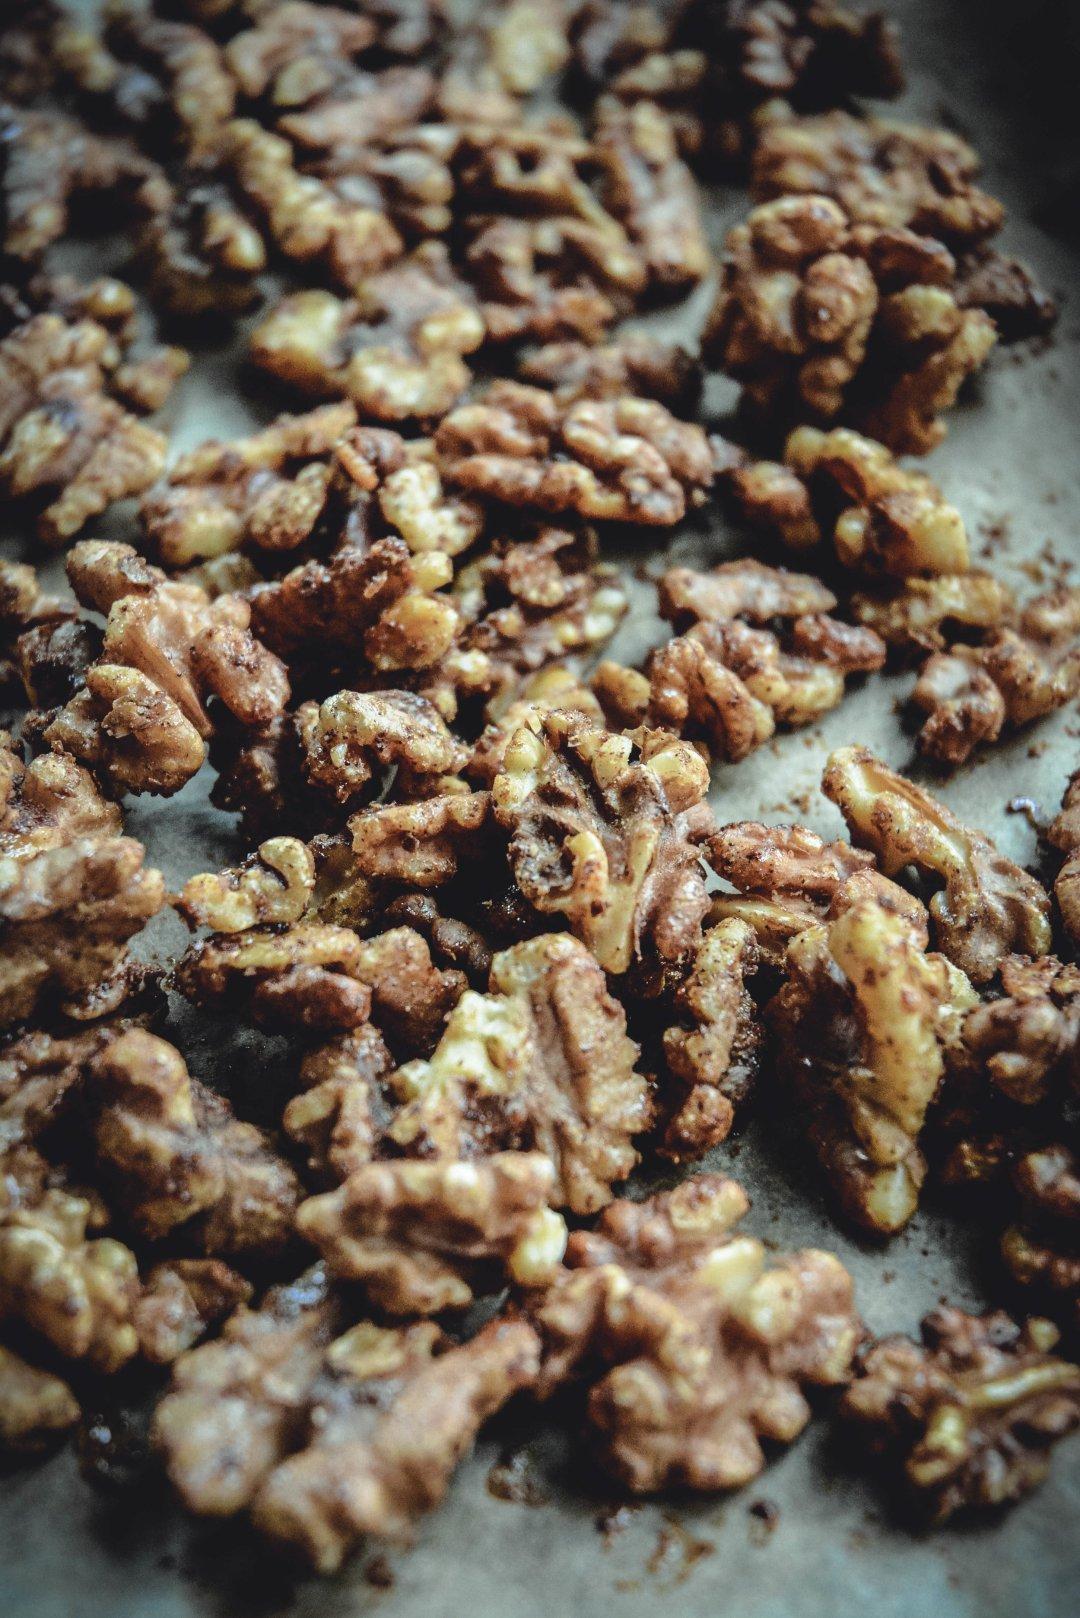 maple cardamom candied walnuts